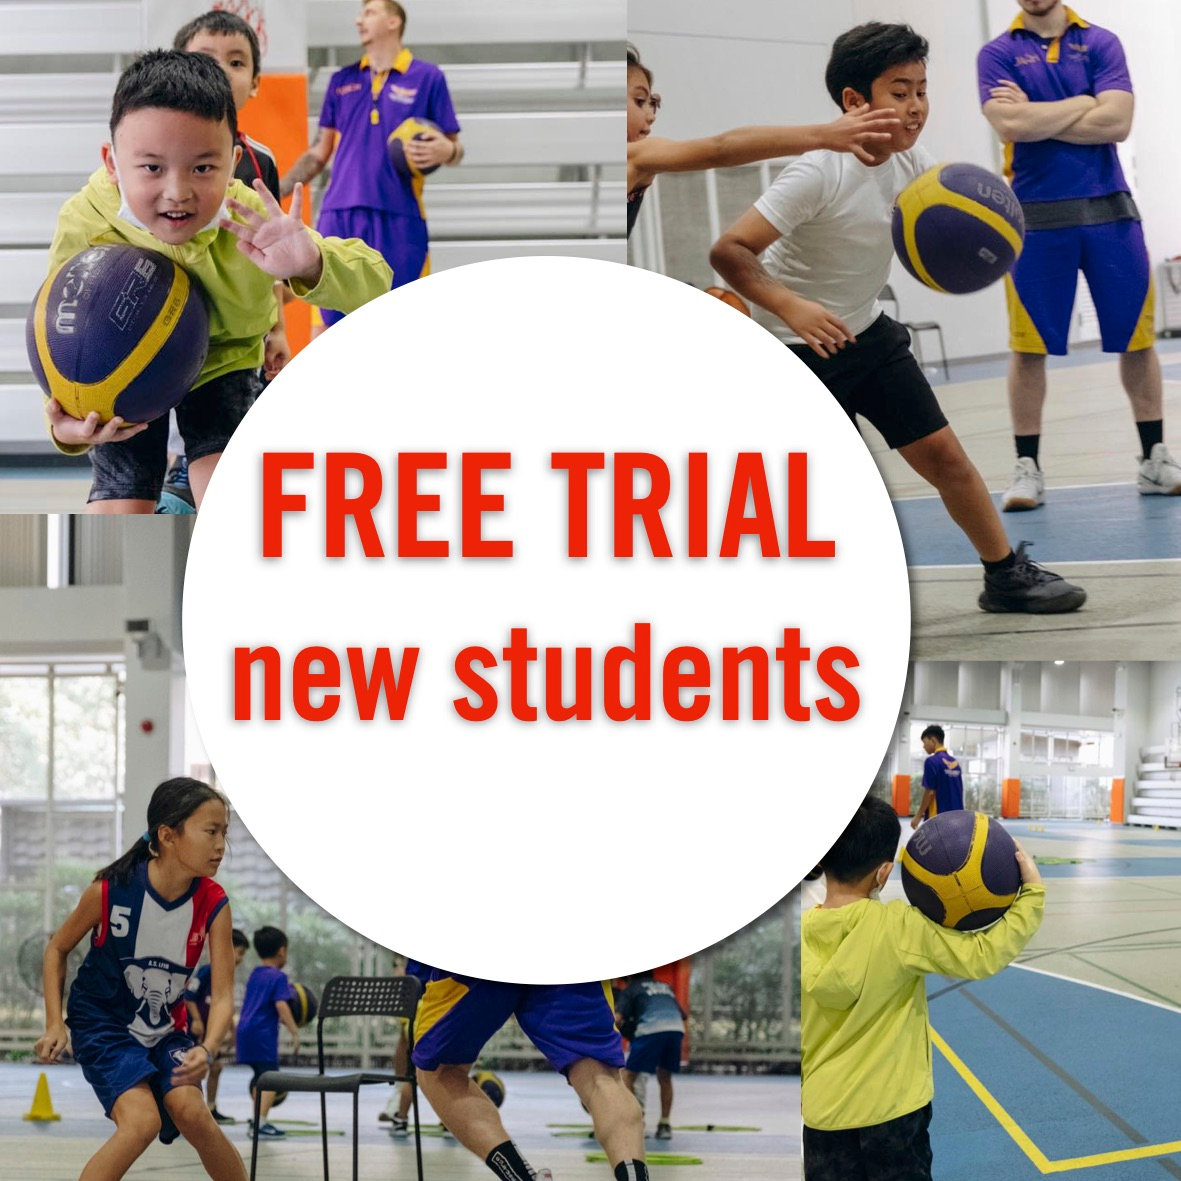 Free Trial -ages 3-18 - 10:30-12:00/SISB